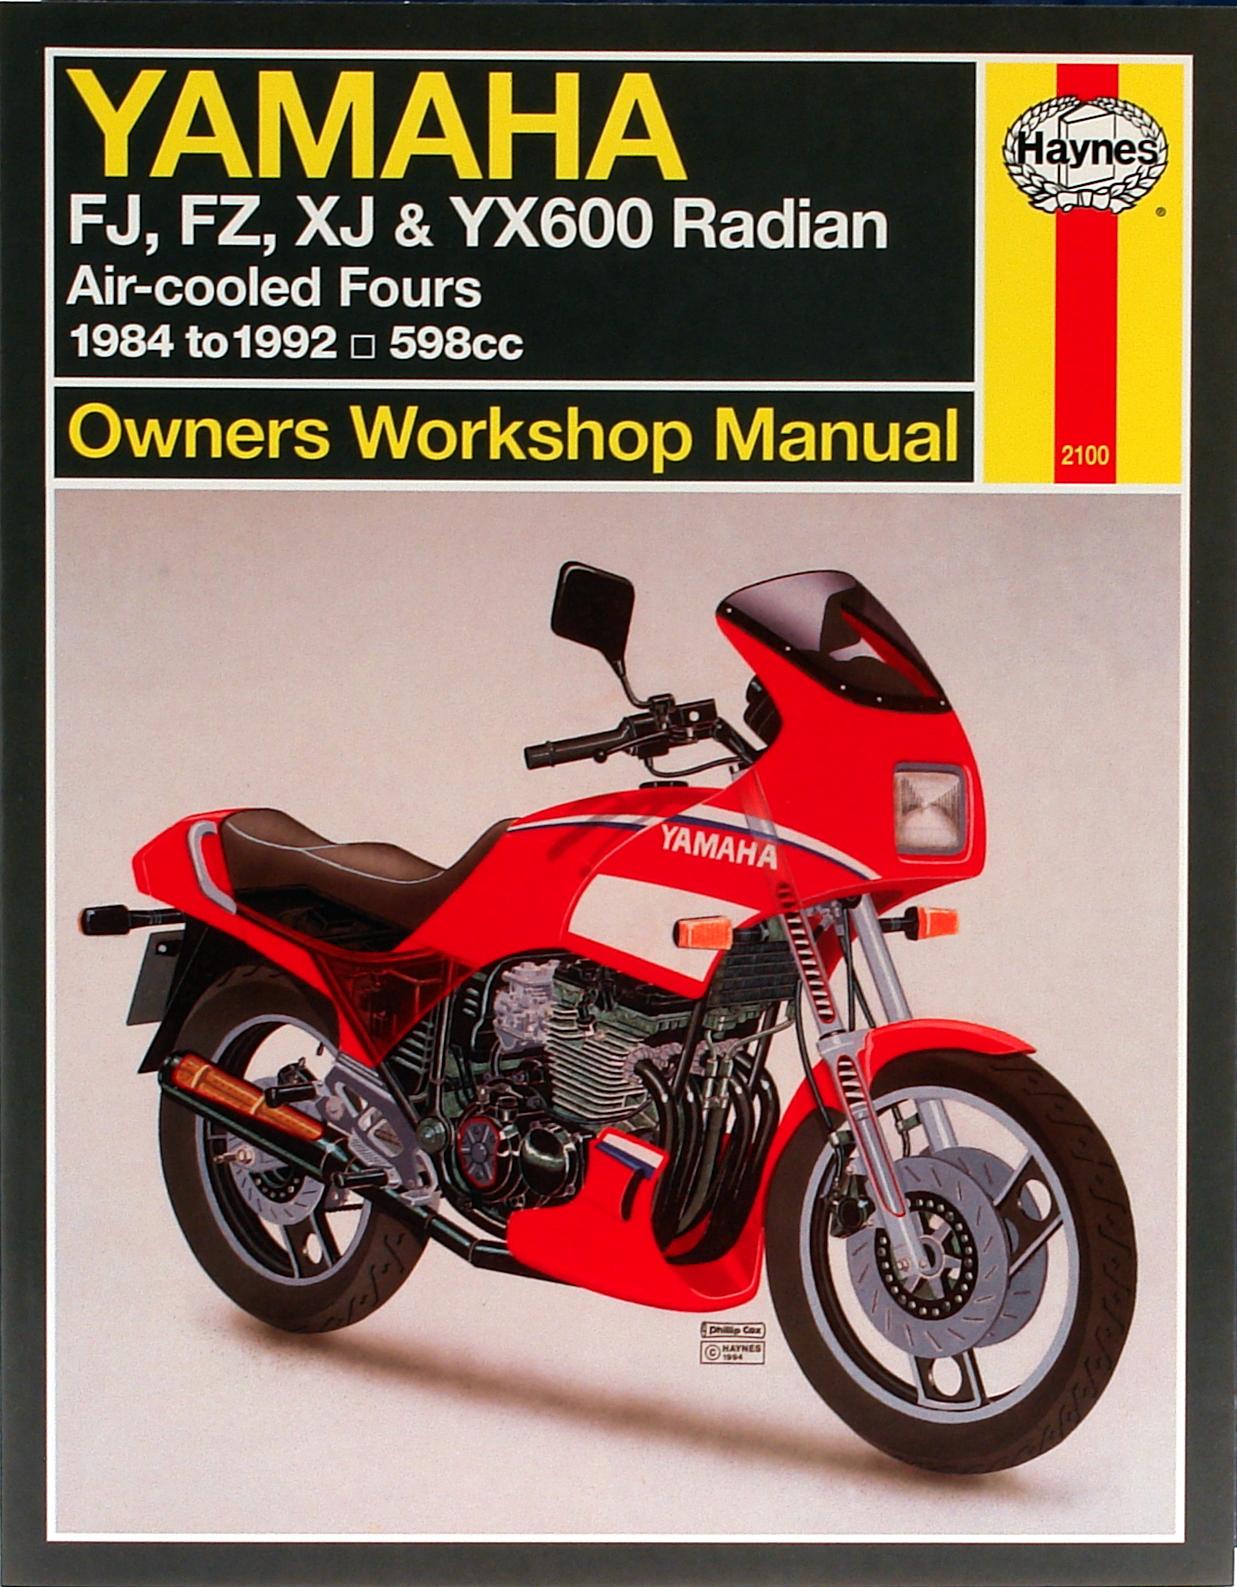 Yamaha YX600 Radian (1986 - 1990) Repair Manuals on